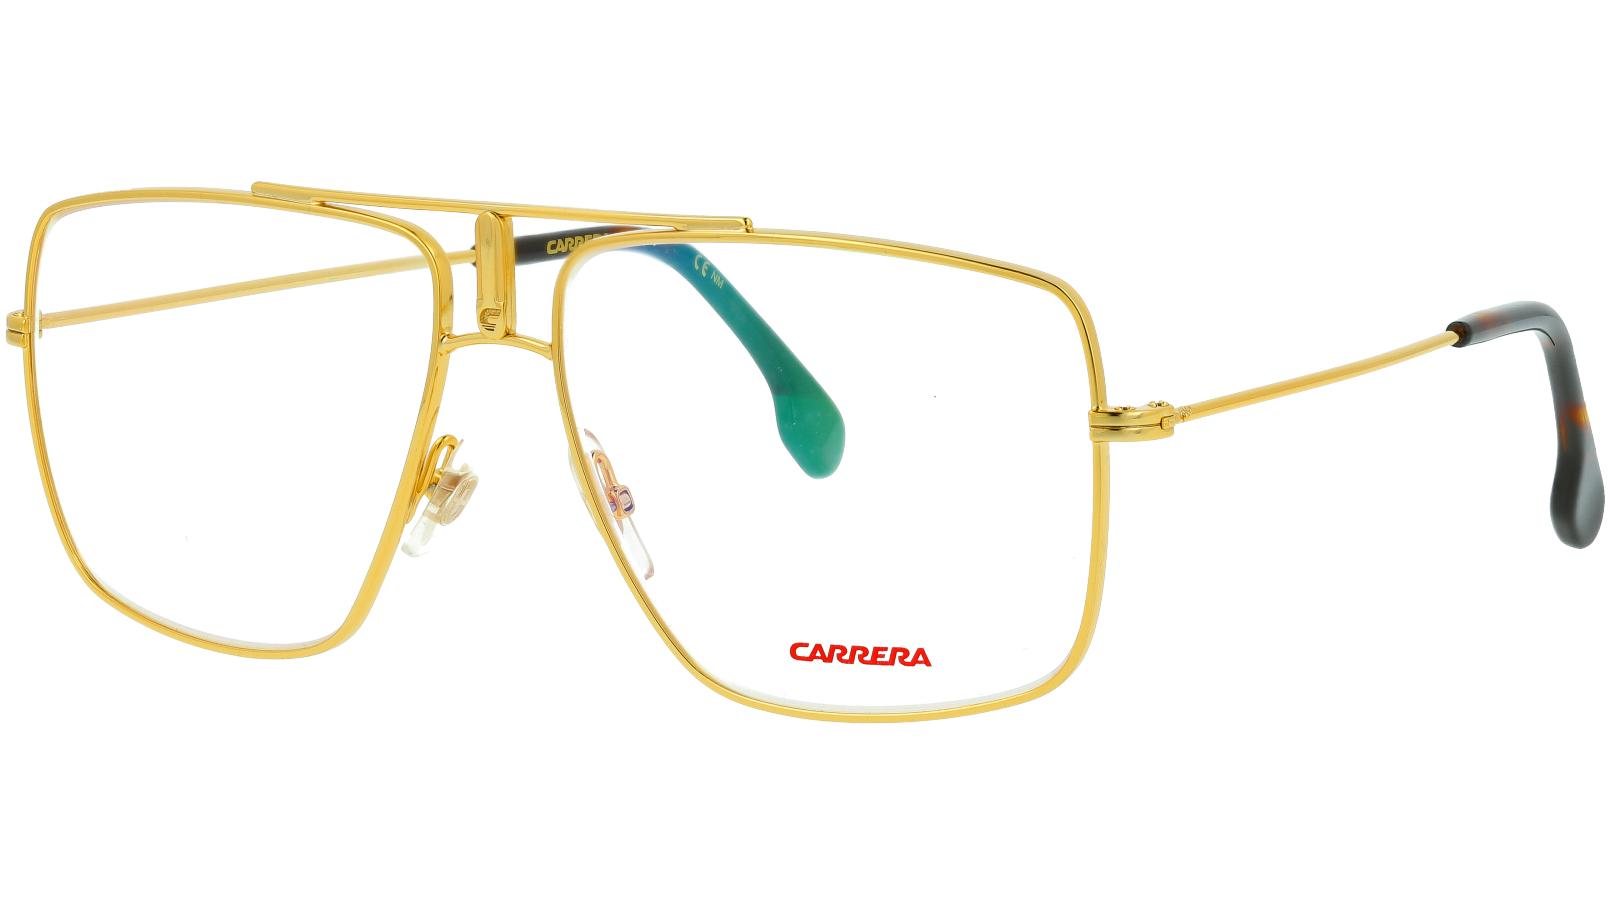 CARRERA CARRERA 1108 001 58 YELLOW Glasses